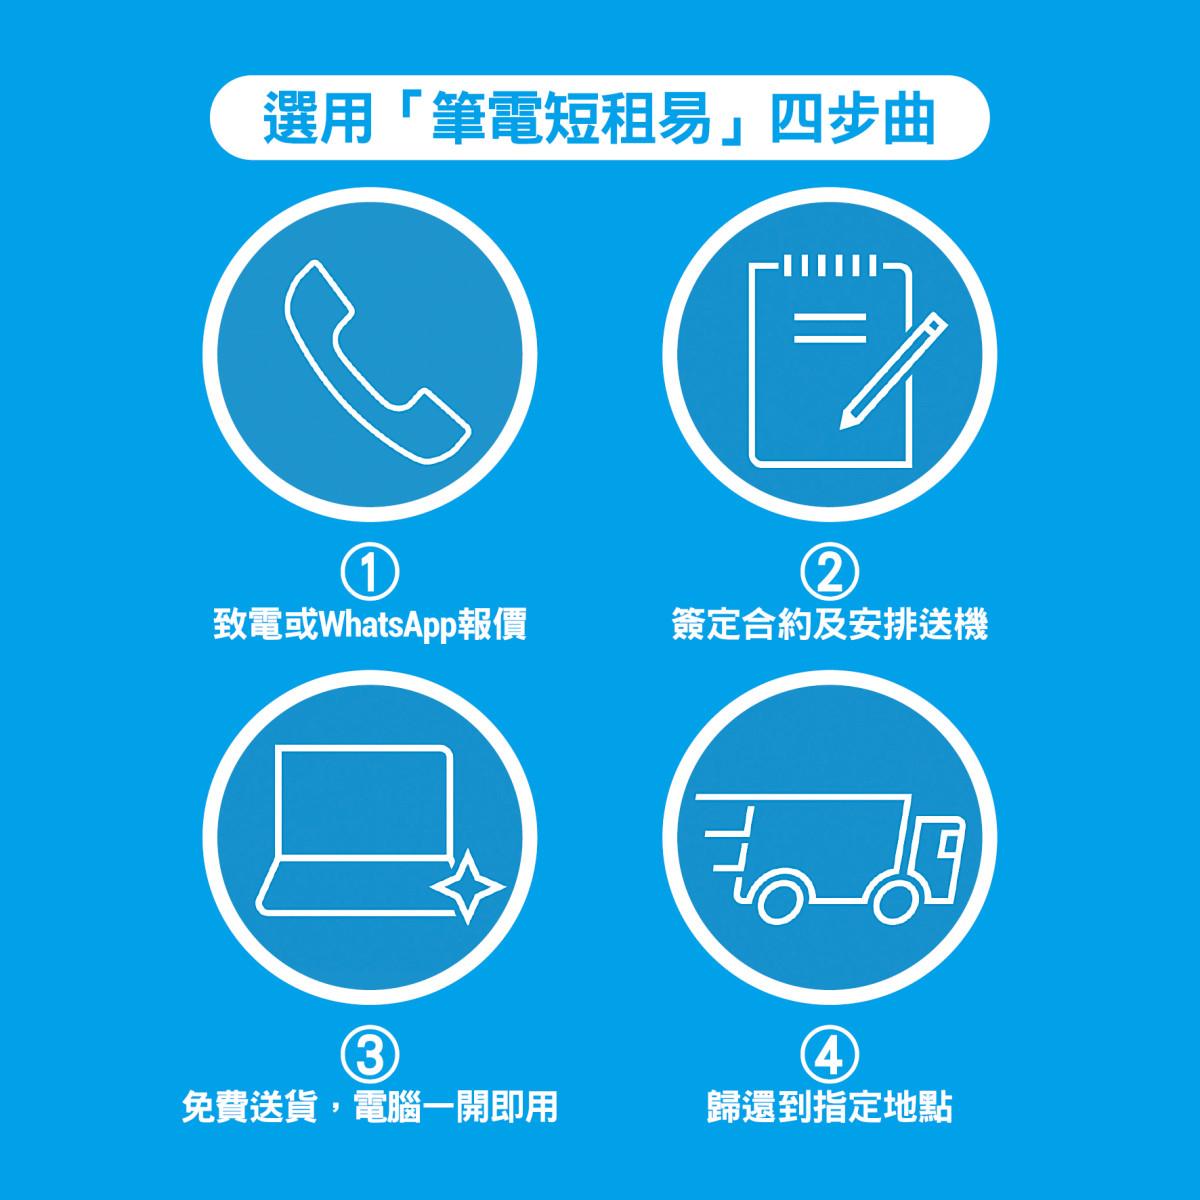 HP DaaS 筆電短租易四步曲